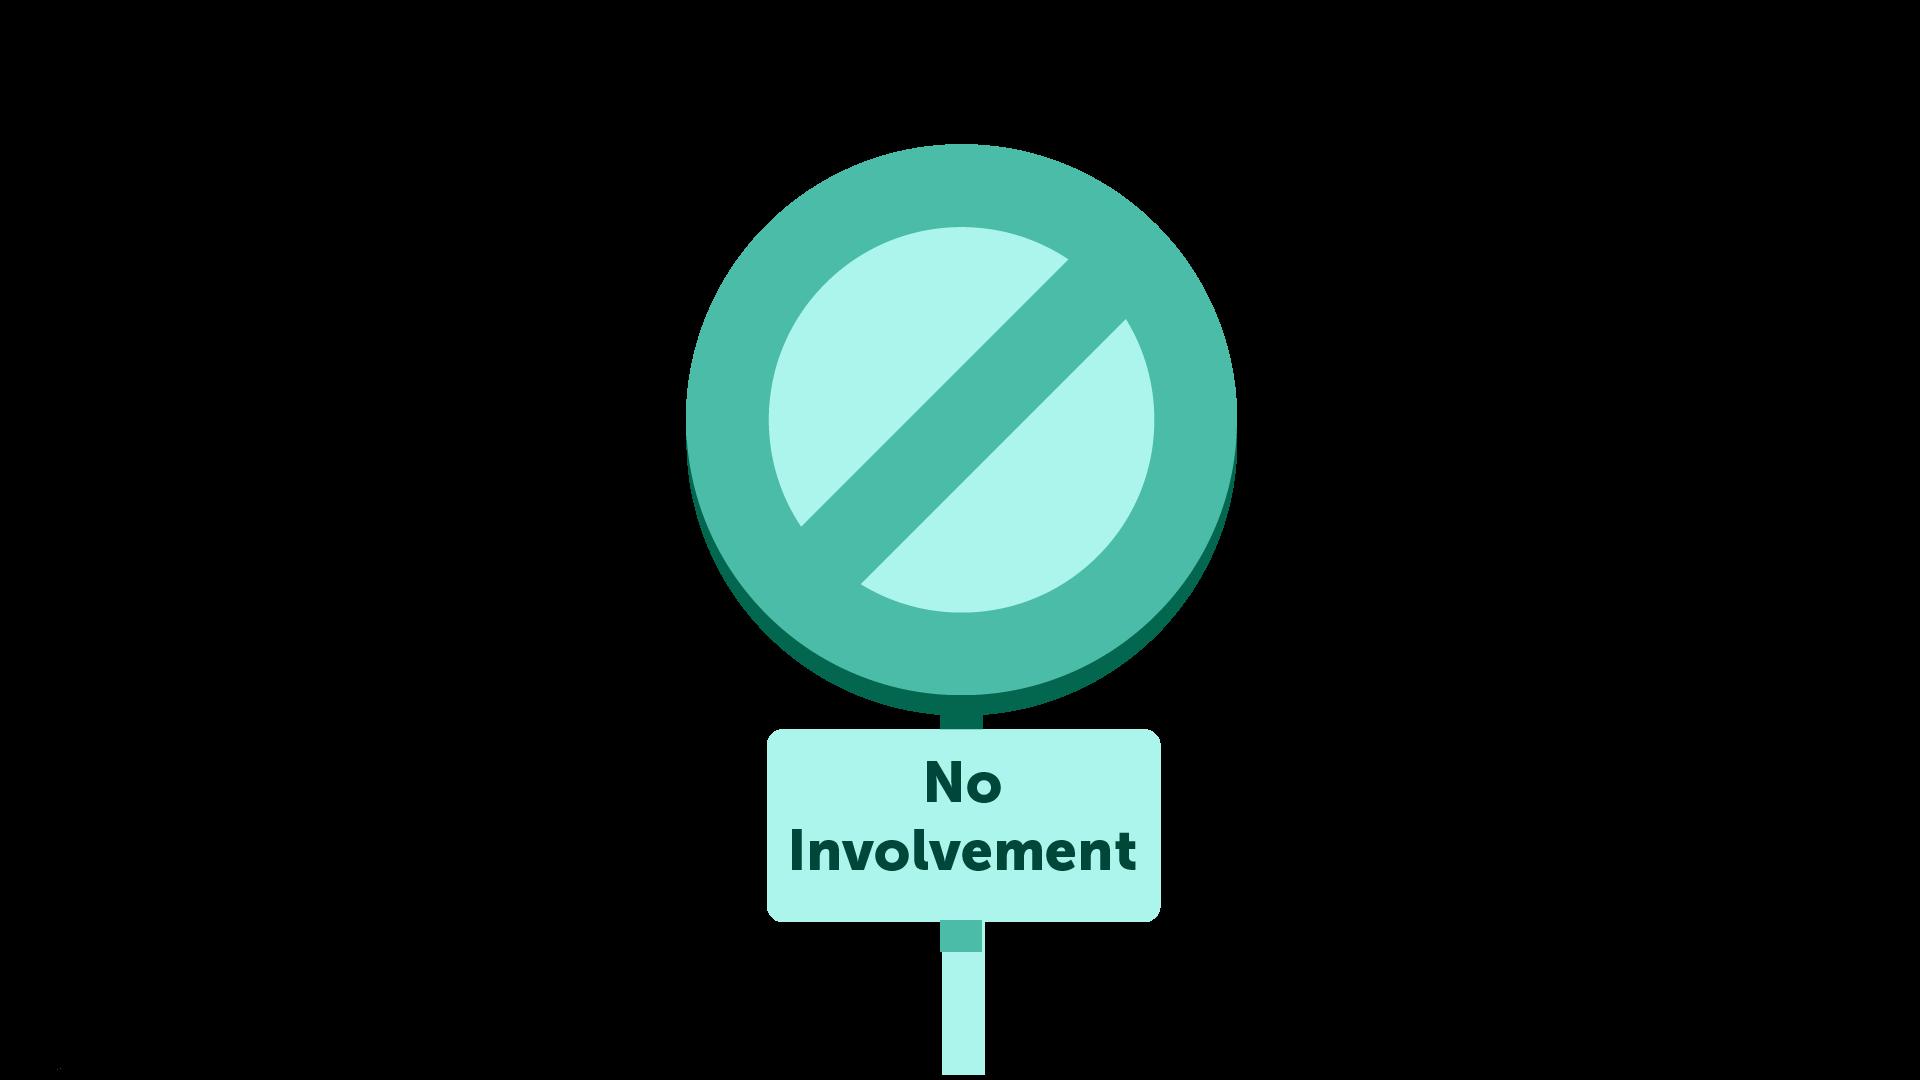 IMAGE: No involvement